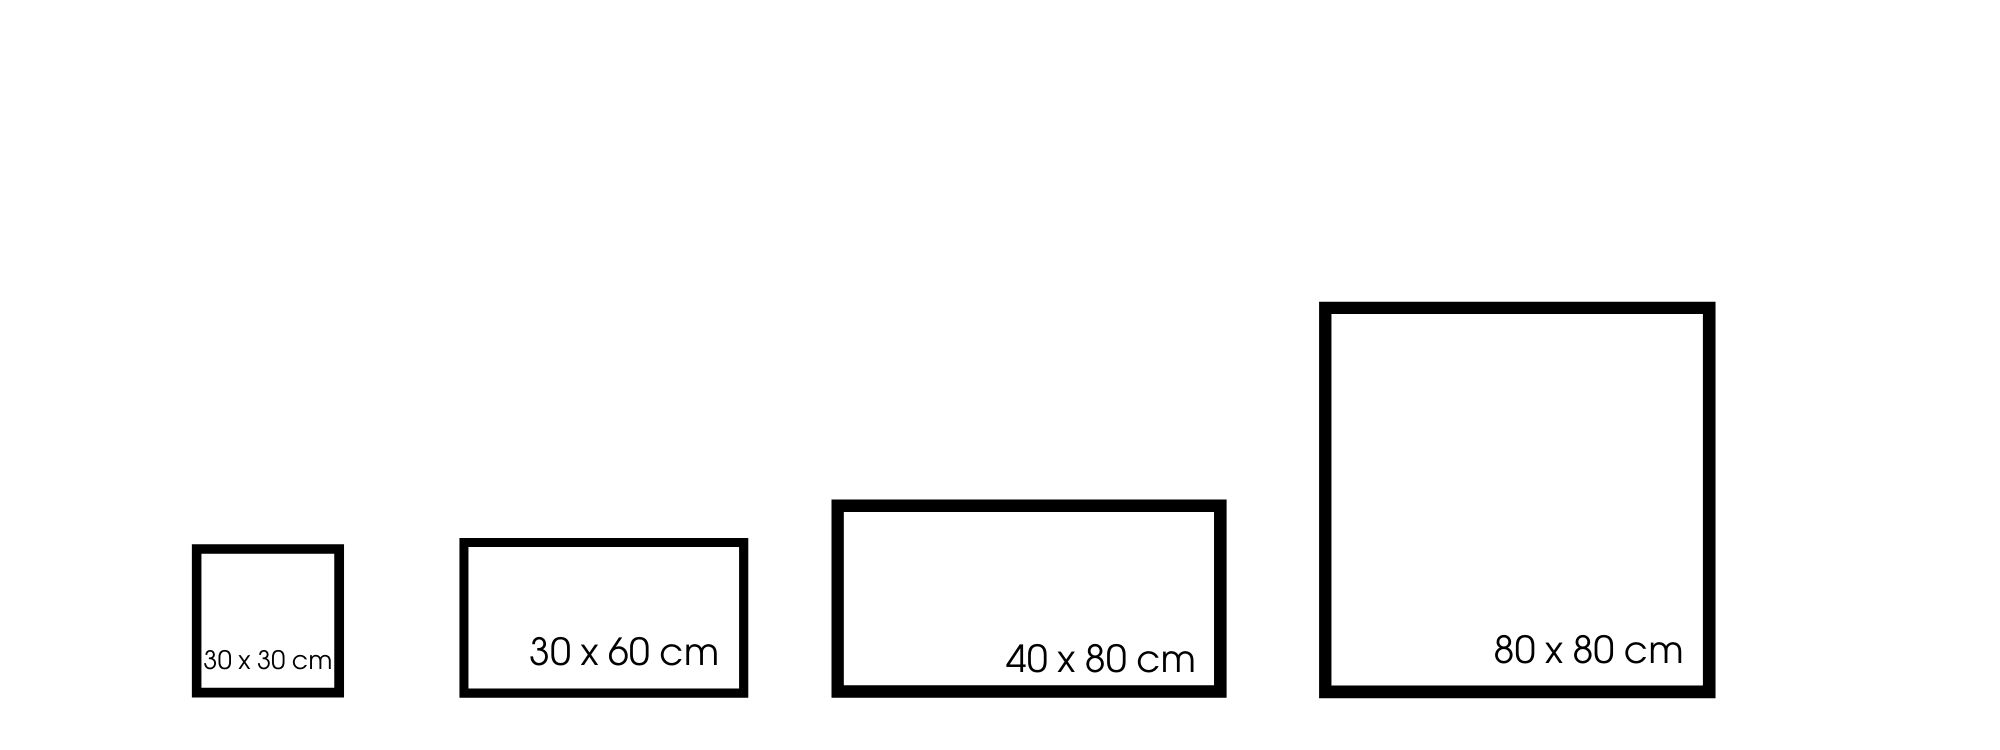 Größen Chimica A